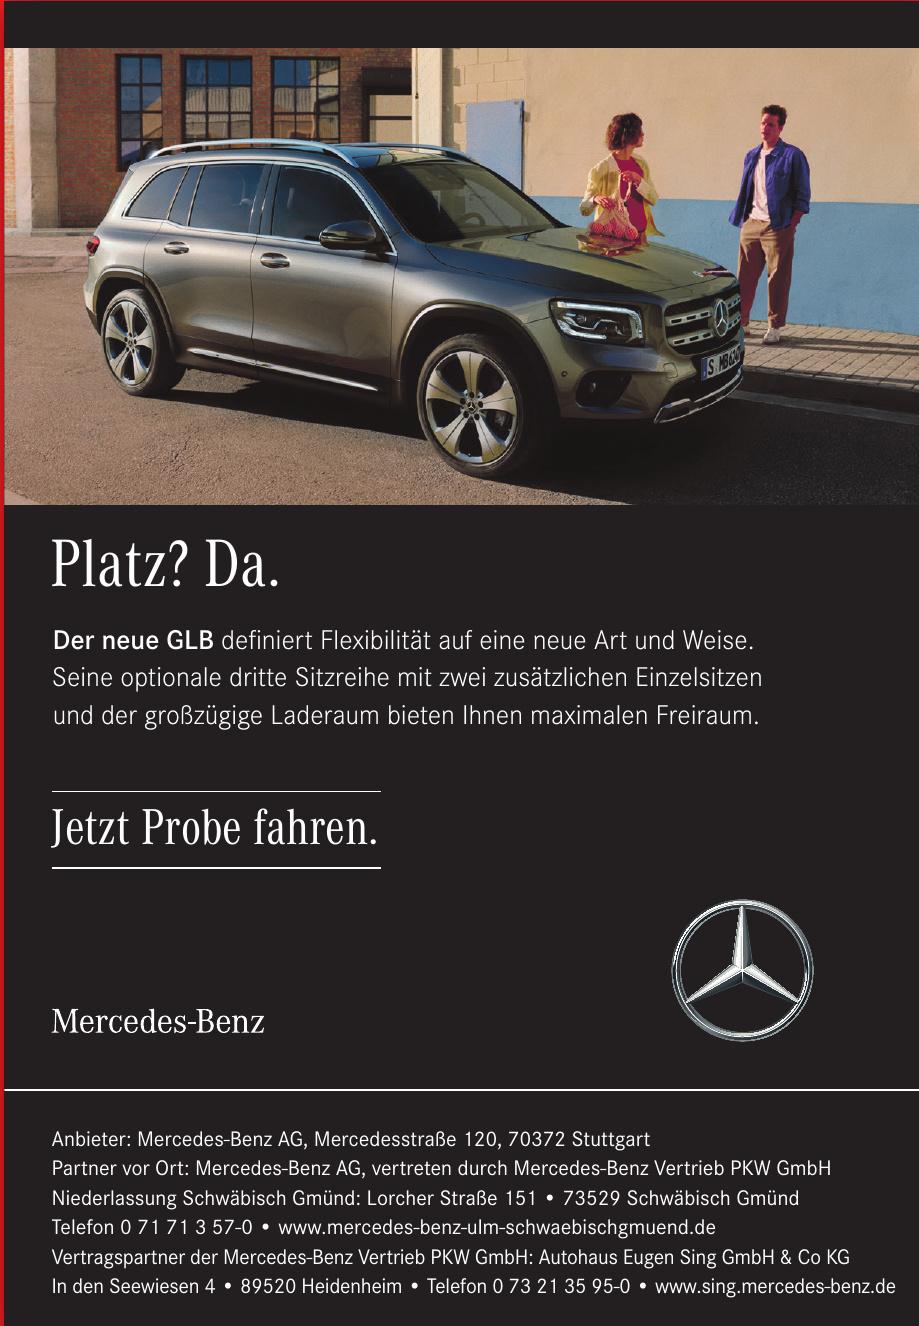 Autohaus Eugen Sing GmbH & Co KG